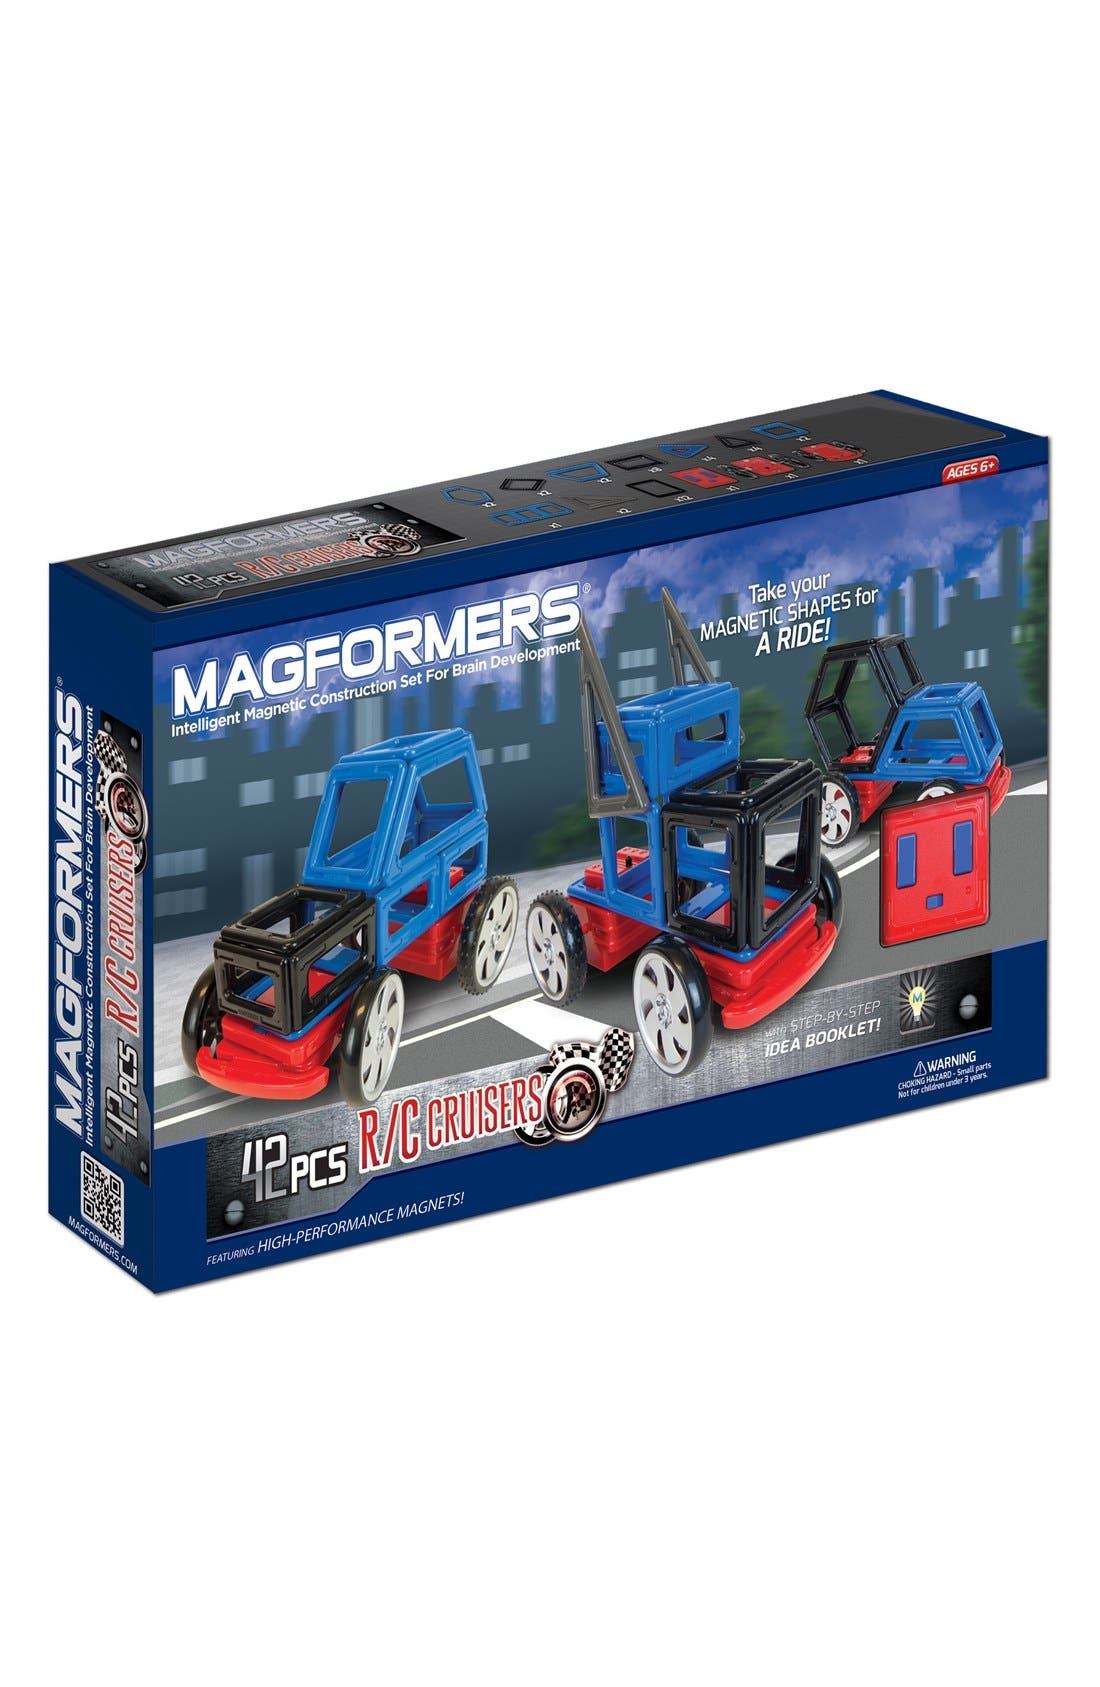 'R/C Cruiser' Magnetic Remote Control Vehicle Construction Kit,                         Main,                         color, Blue/ Black